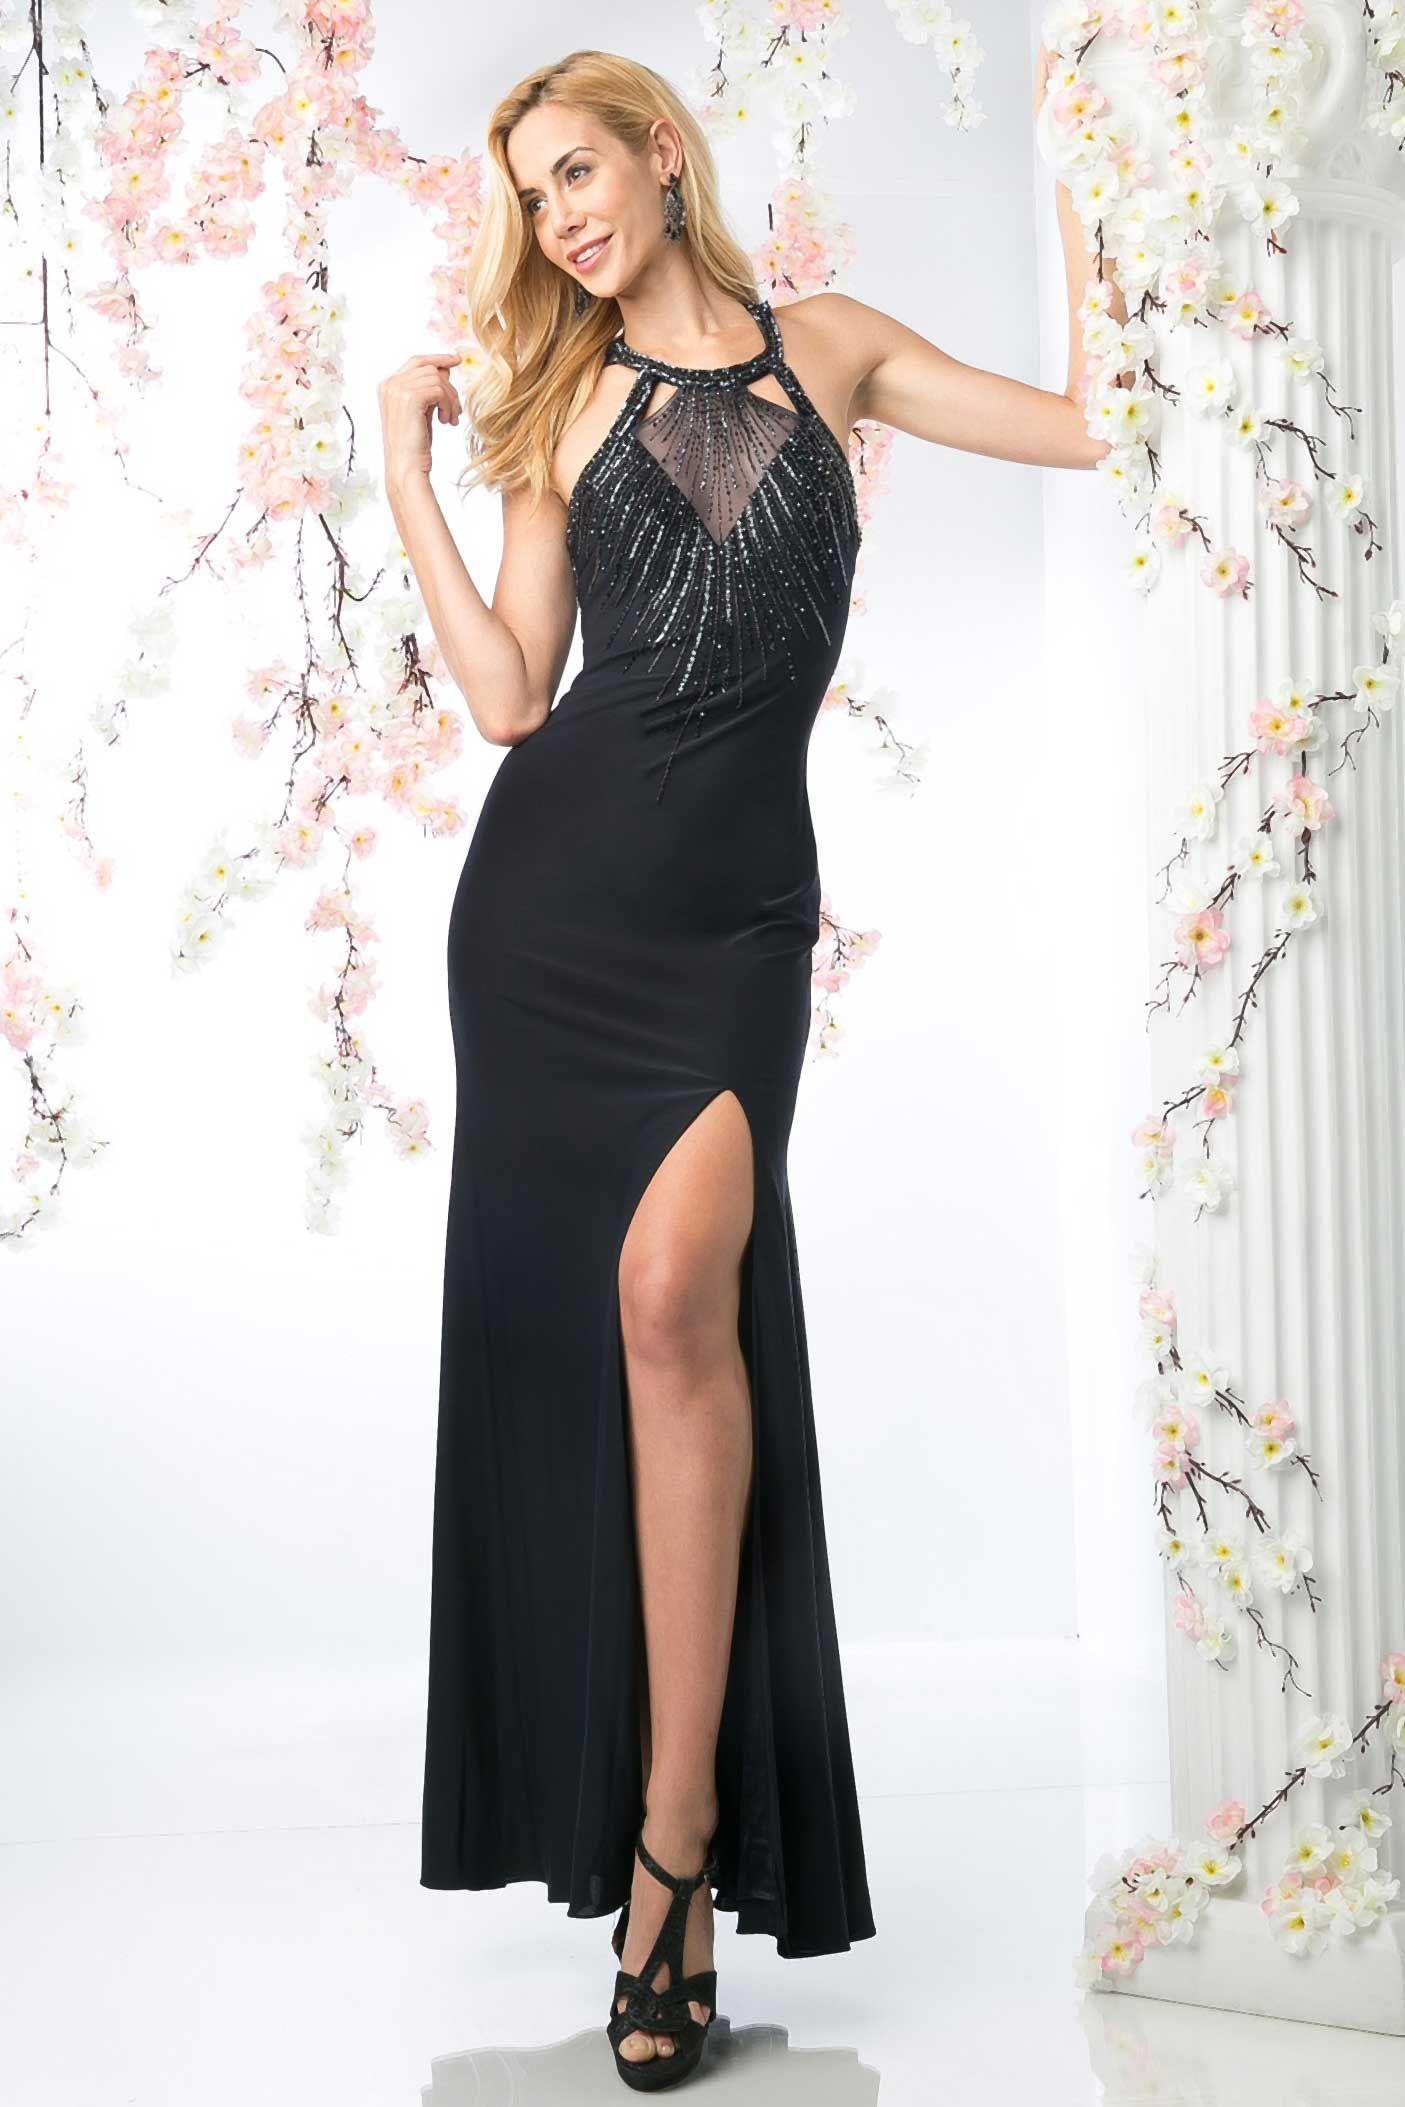 Long evening dress cdj sheath shape long prom and evening dress